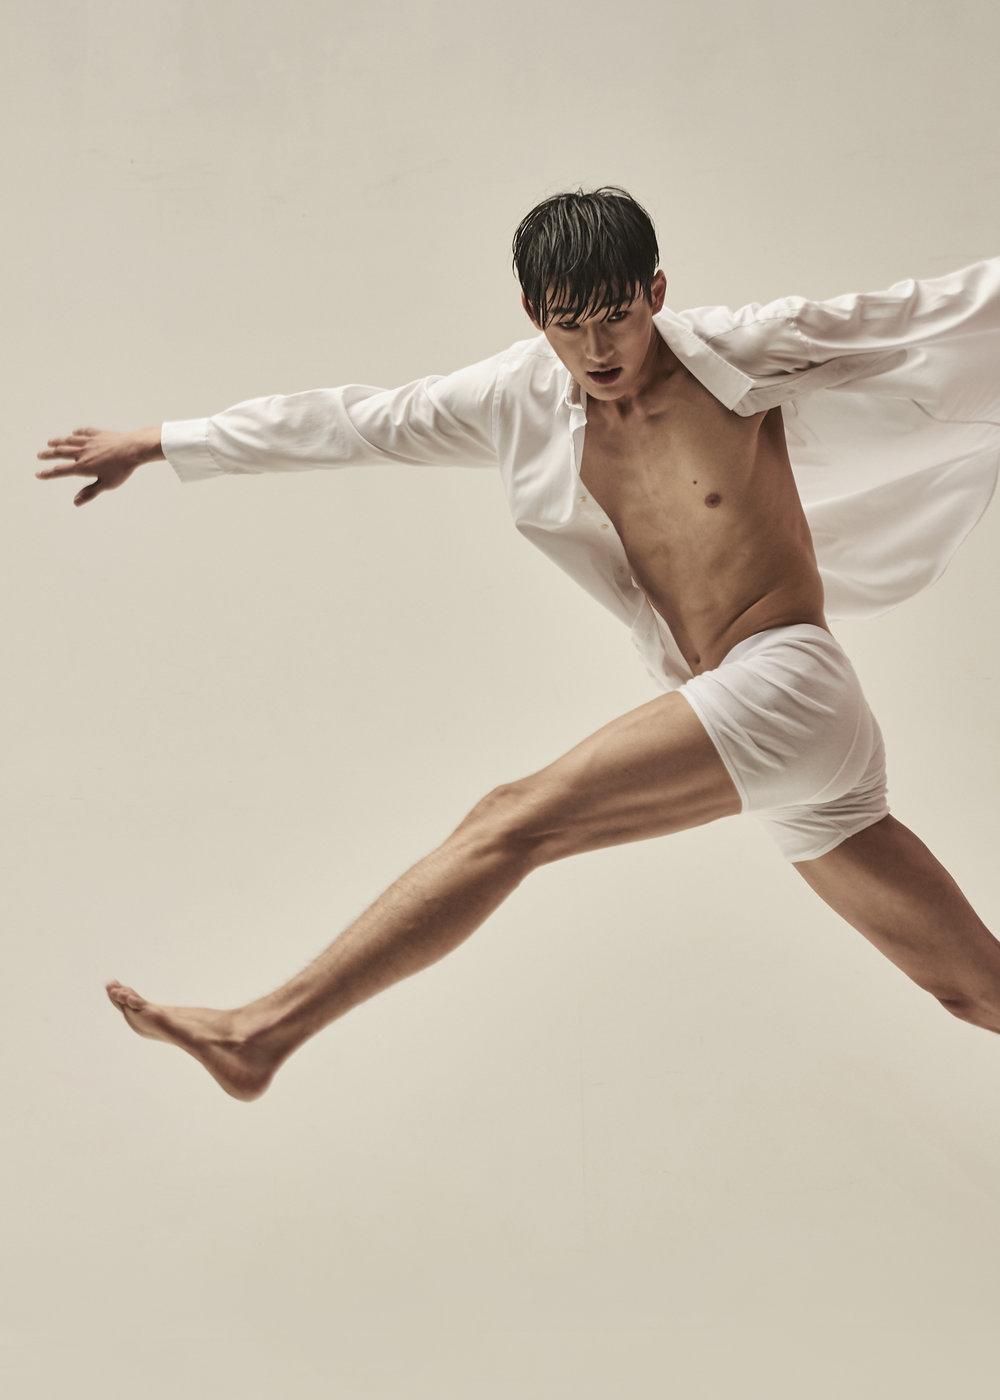 Model Hwang Sewoong @sw_hwangg  Makeup Jeong Hyeran @muaheran